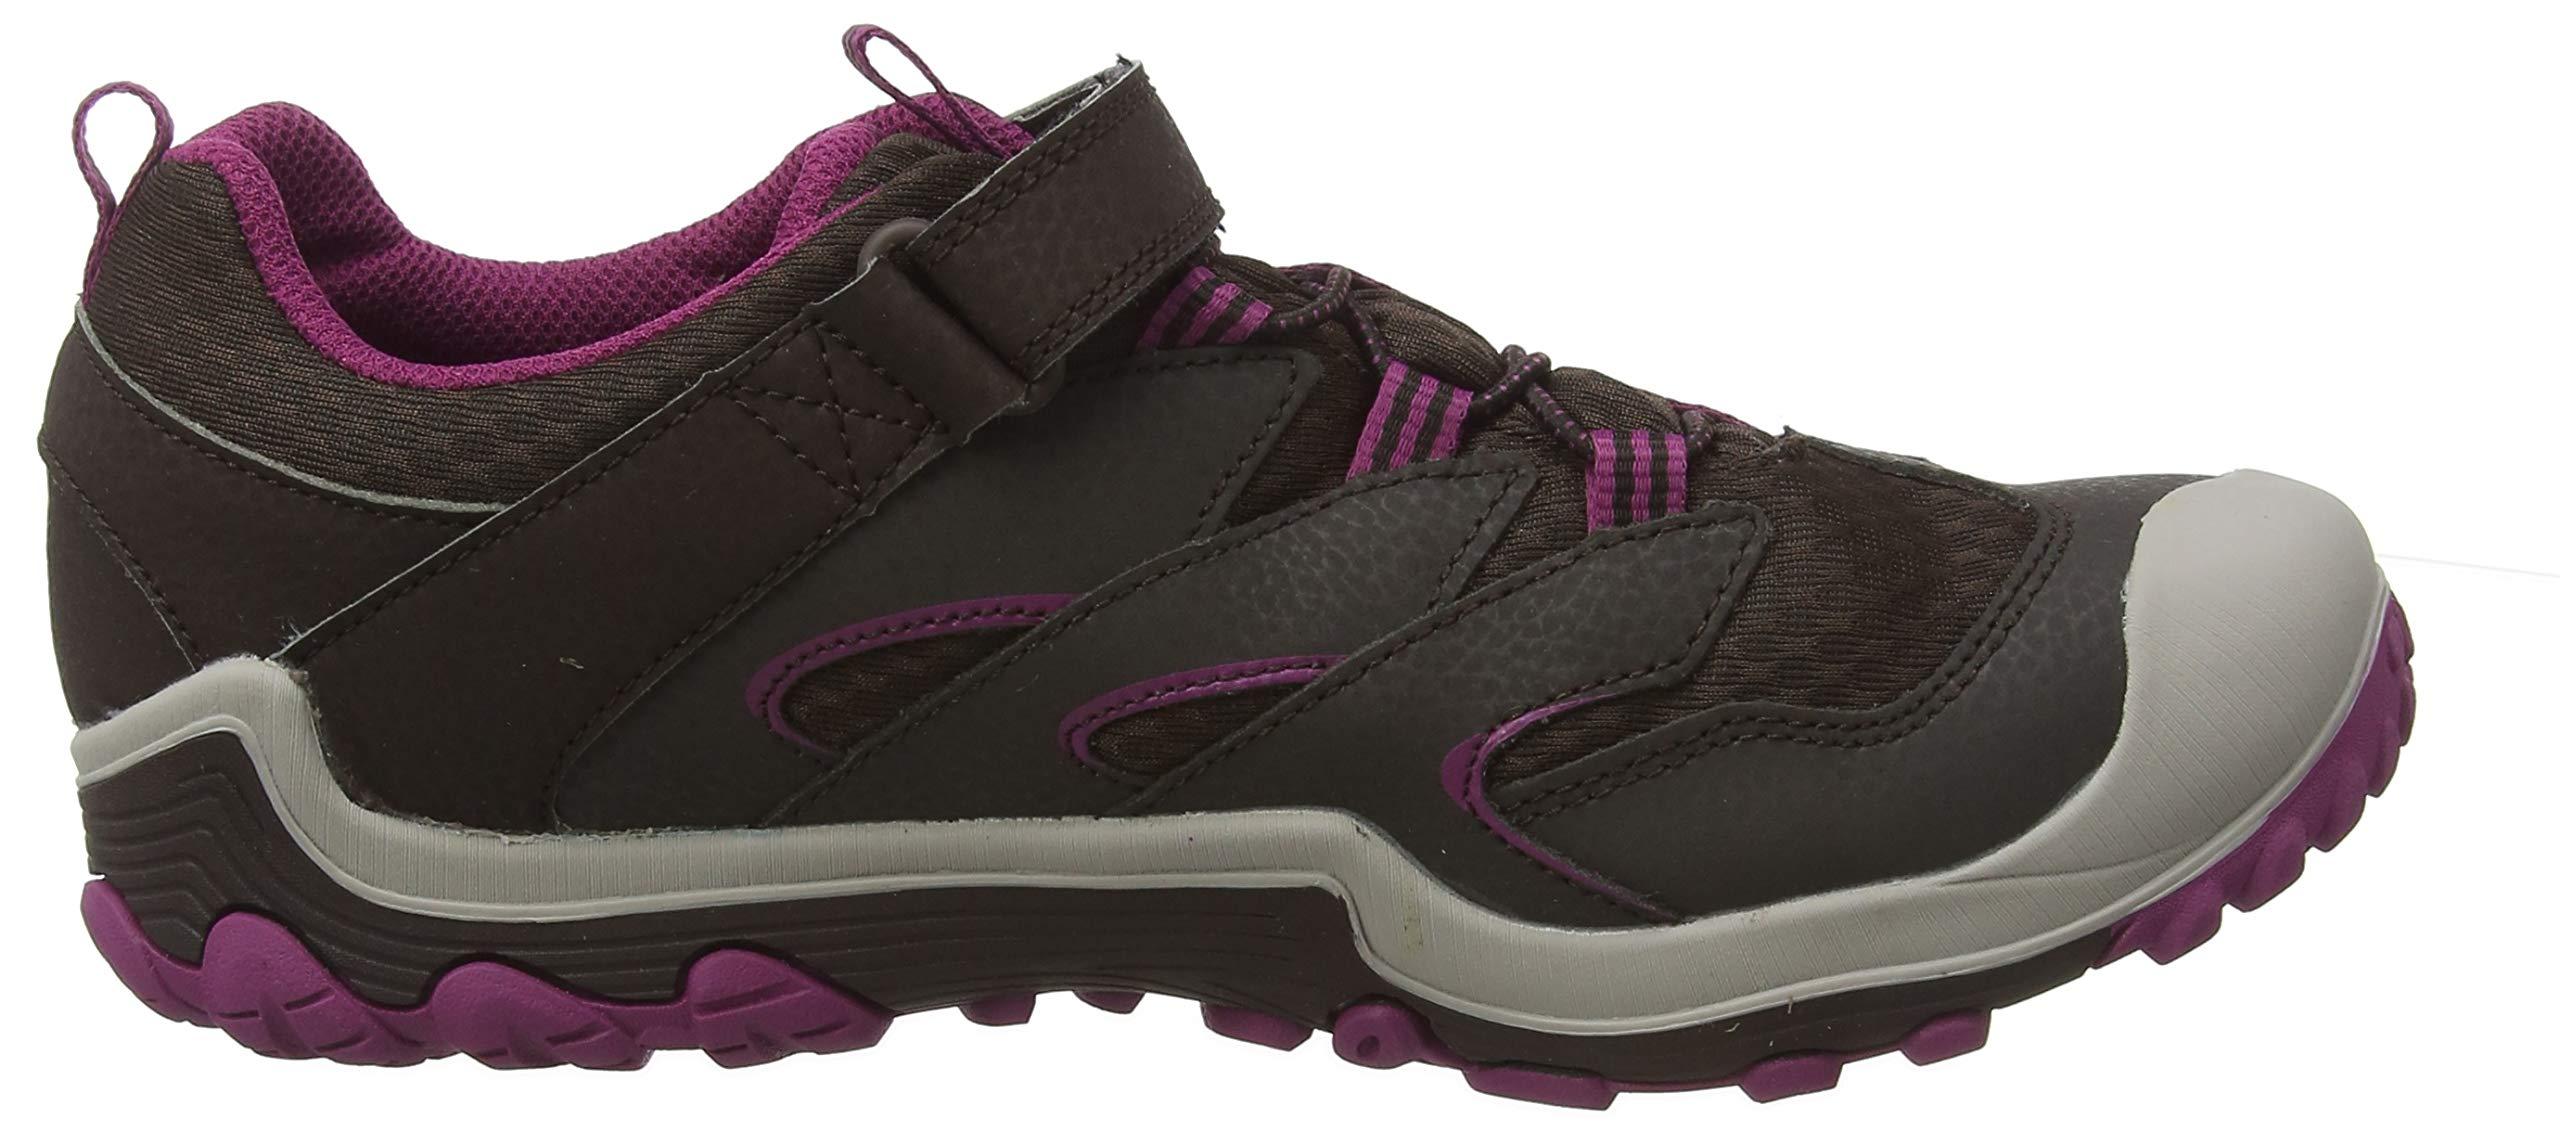 Merrell Unisex Kids M-Chameleon 7 Low a/C Waterproof Rise Hiking Boots 6